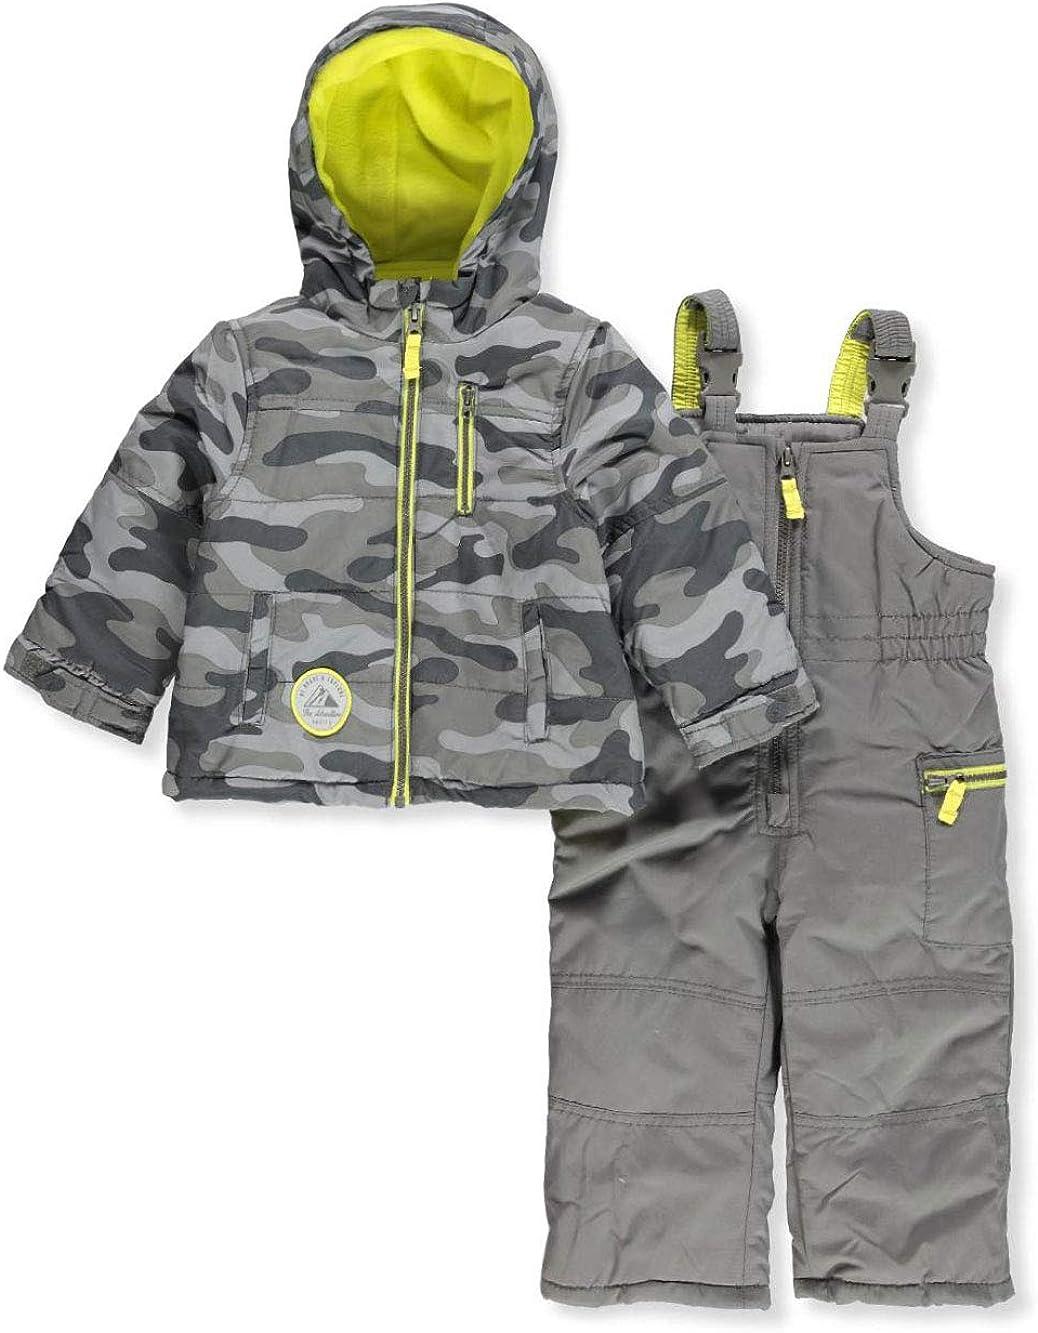 Carters Baby Boys Heavyweight 2-Piece Skisuit Snowsuit